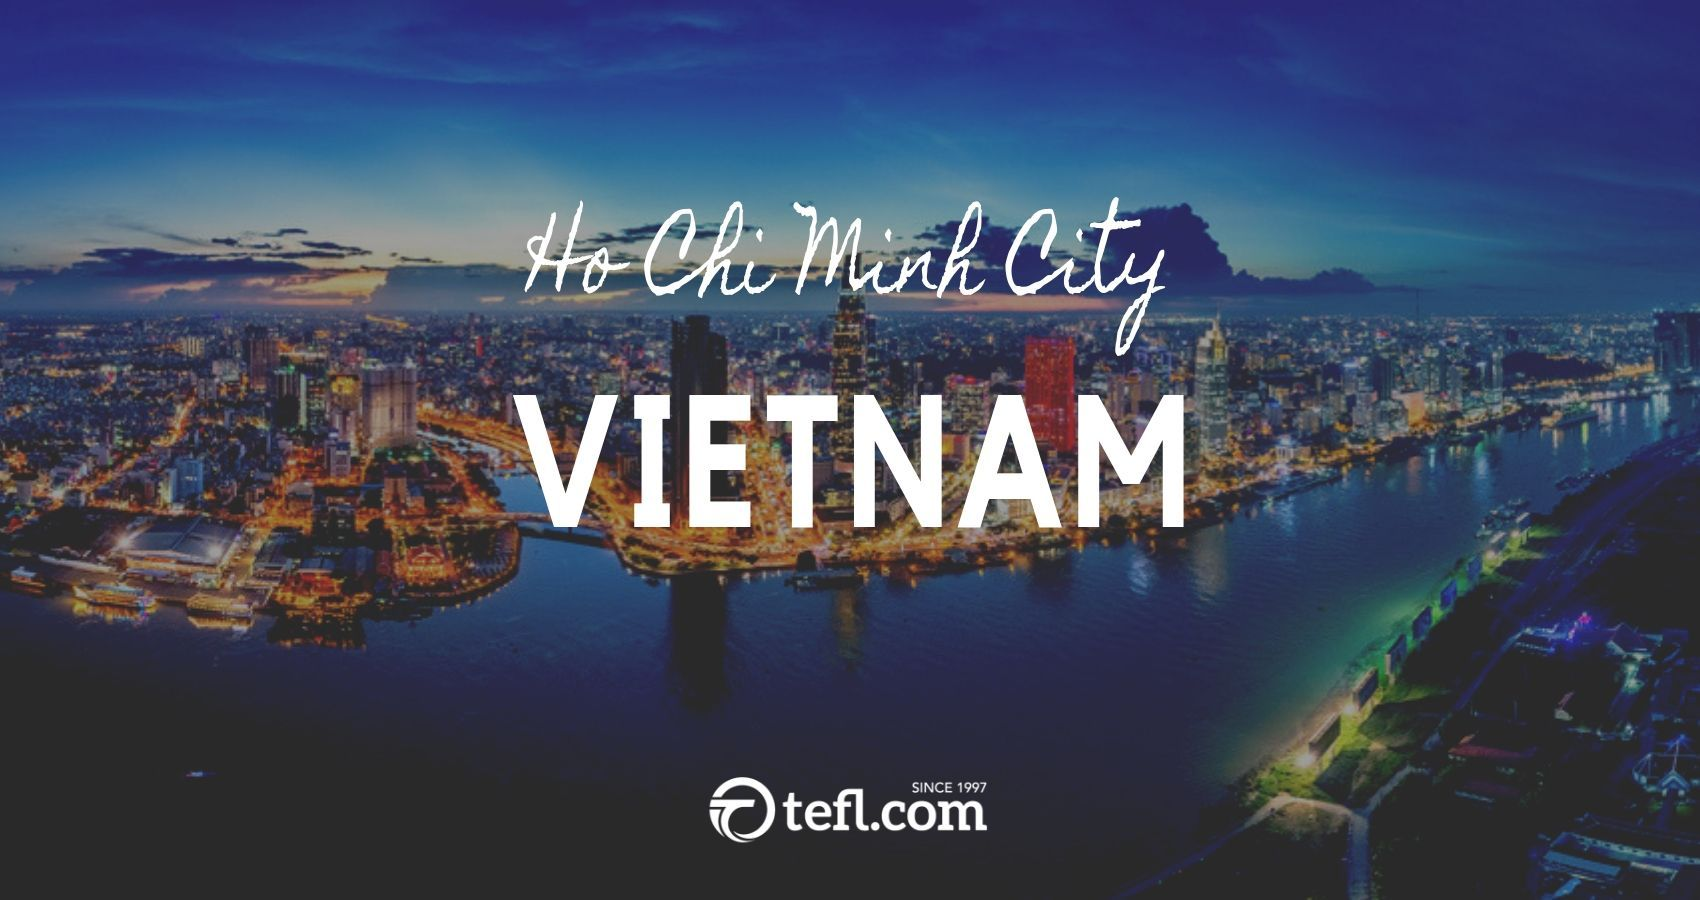 Vietnam Ho Chi Minh City. FULL TIME TEACHER https//tefl